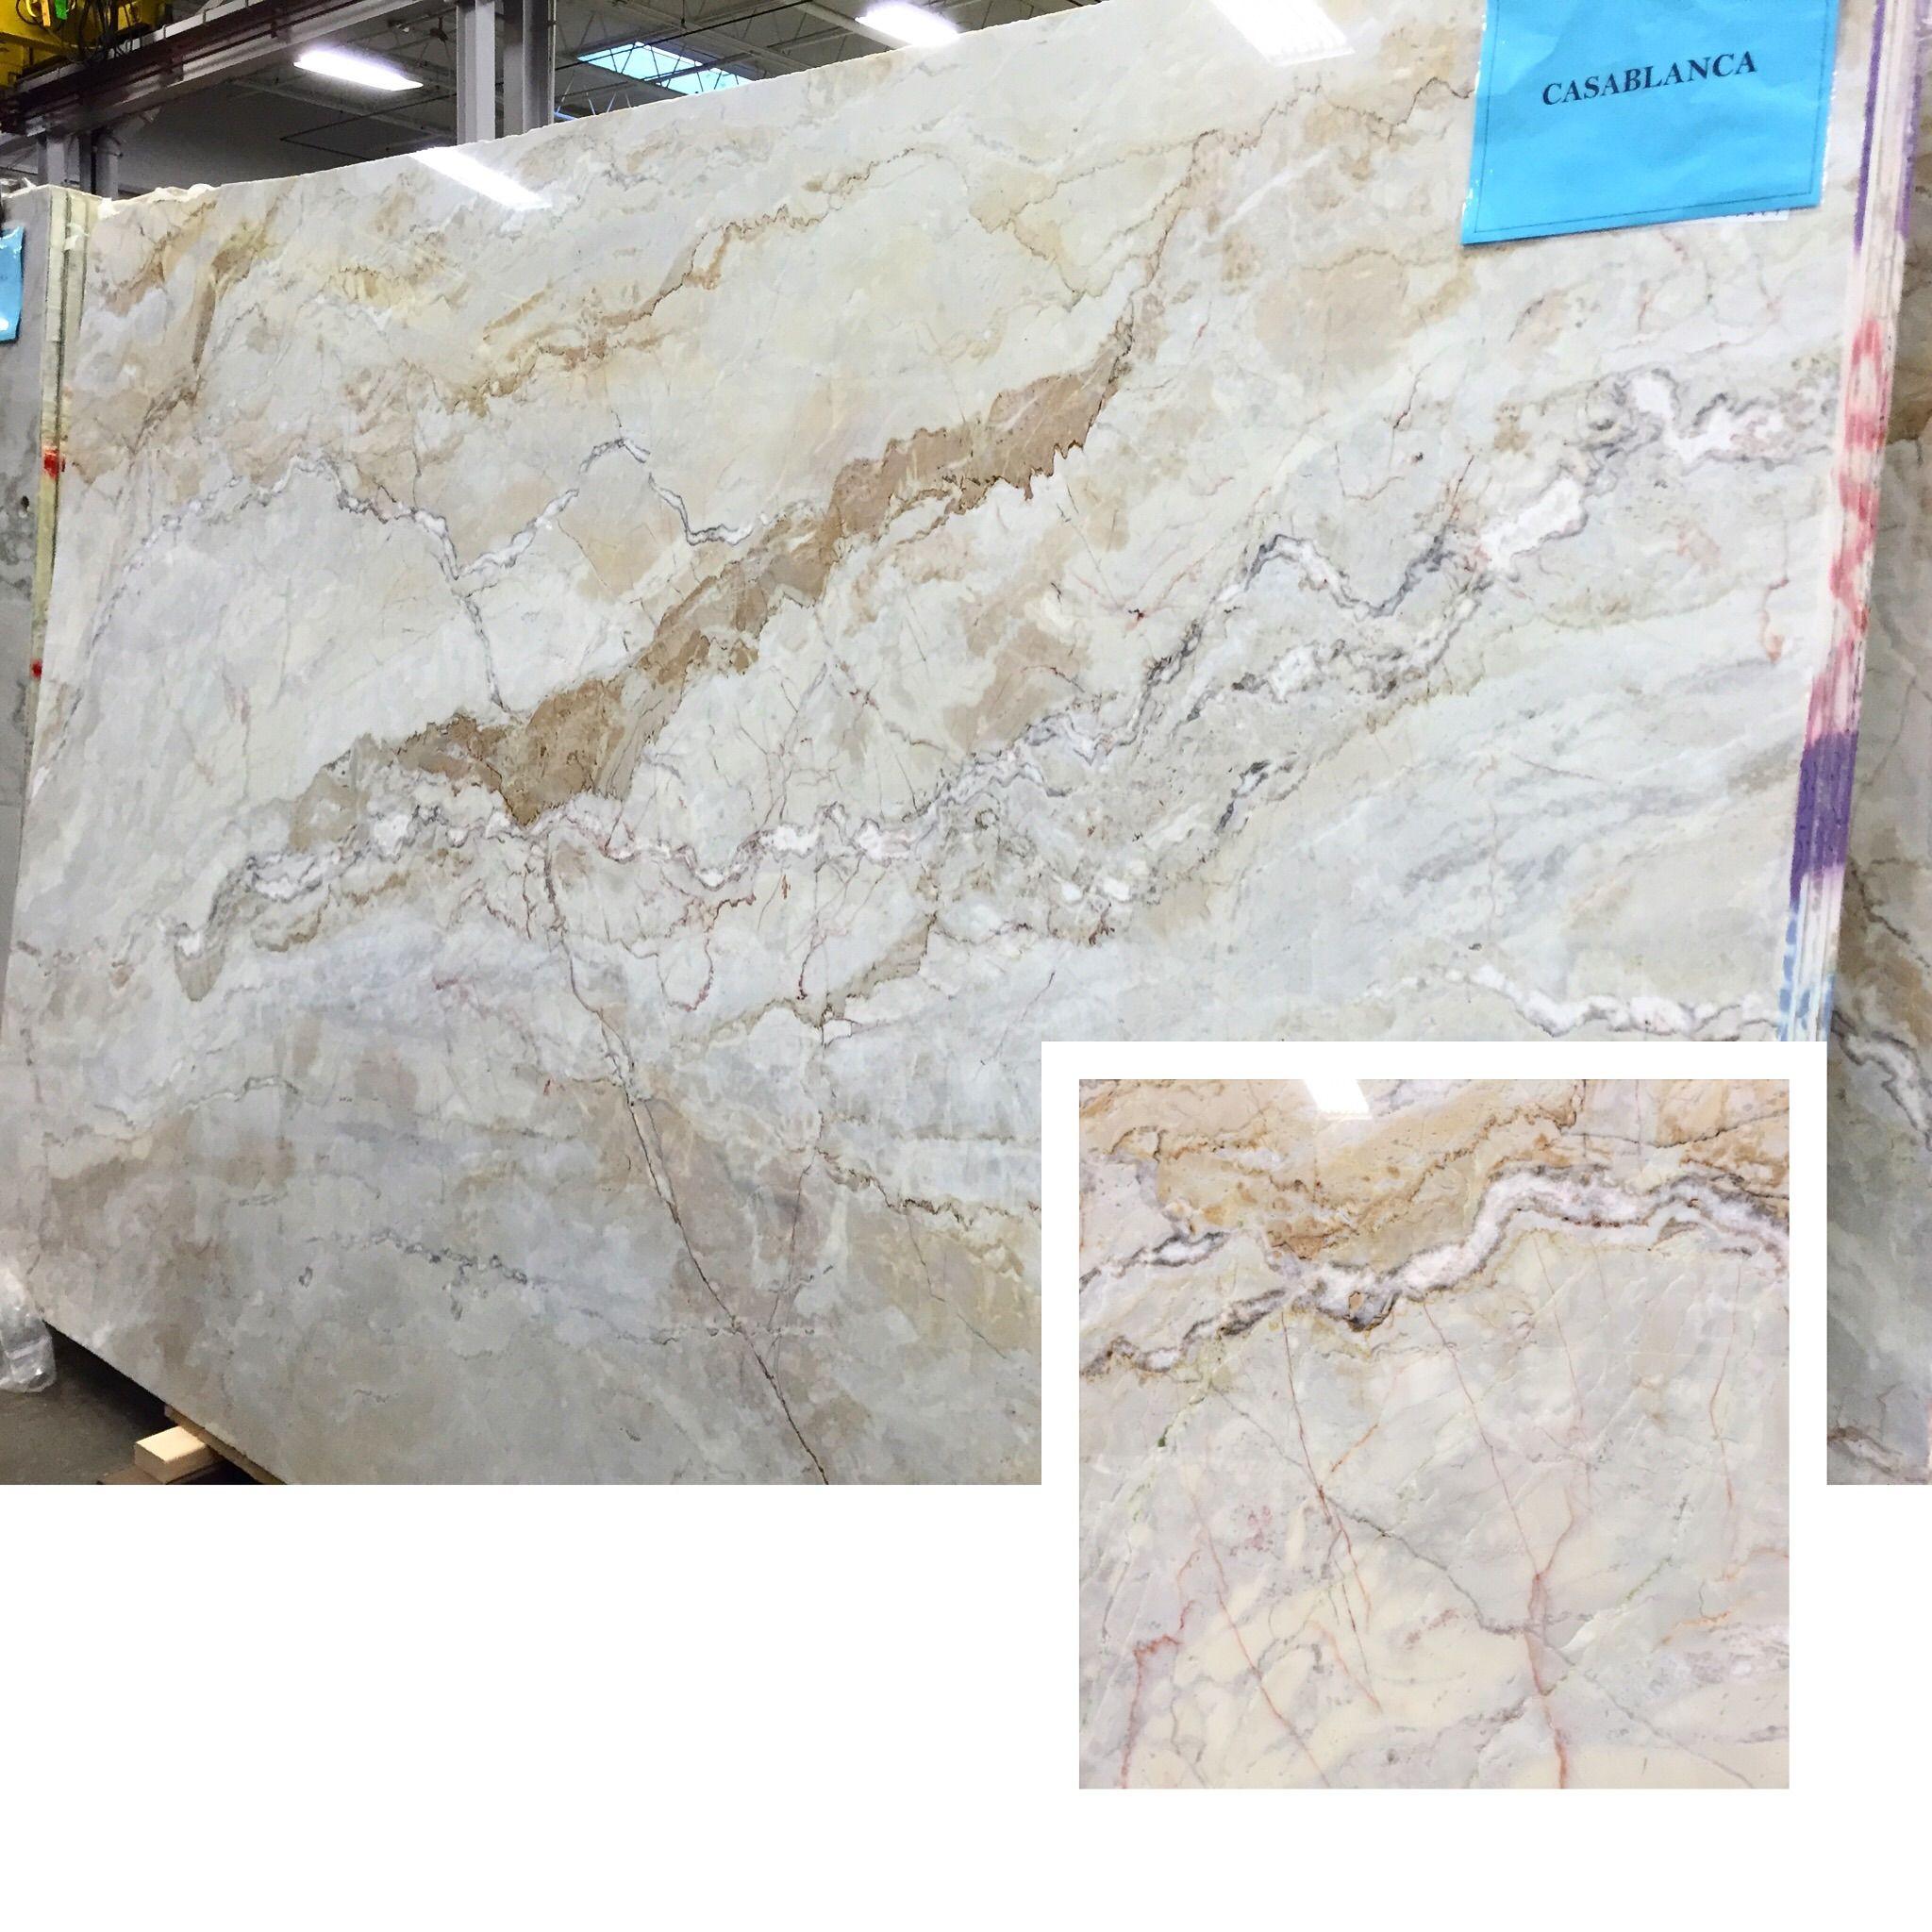 Quartz And Granite Kitchens: One Of Our BRAND NEW Slabs; Casablanca Quartzite